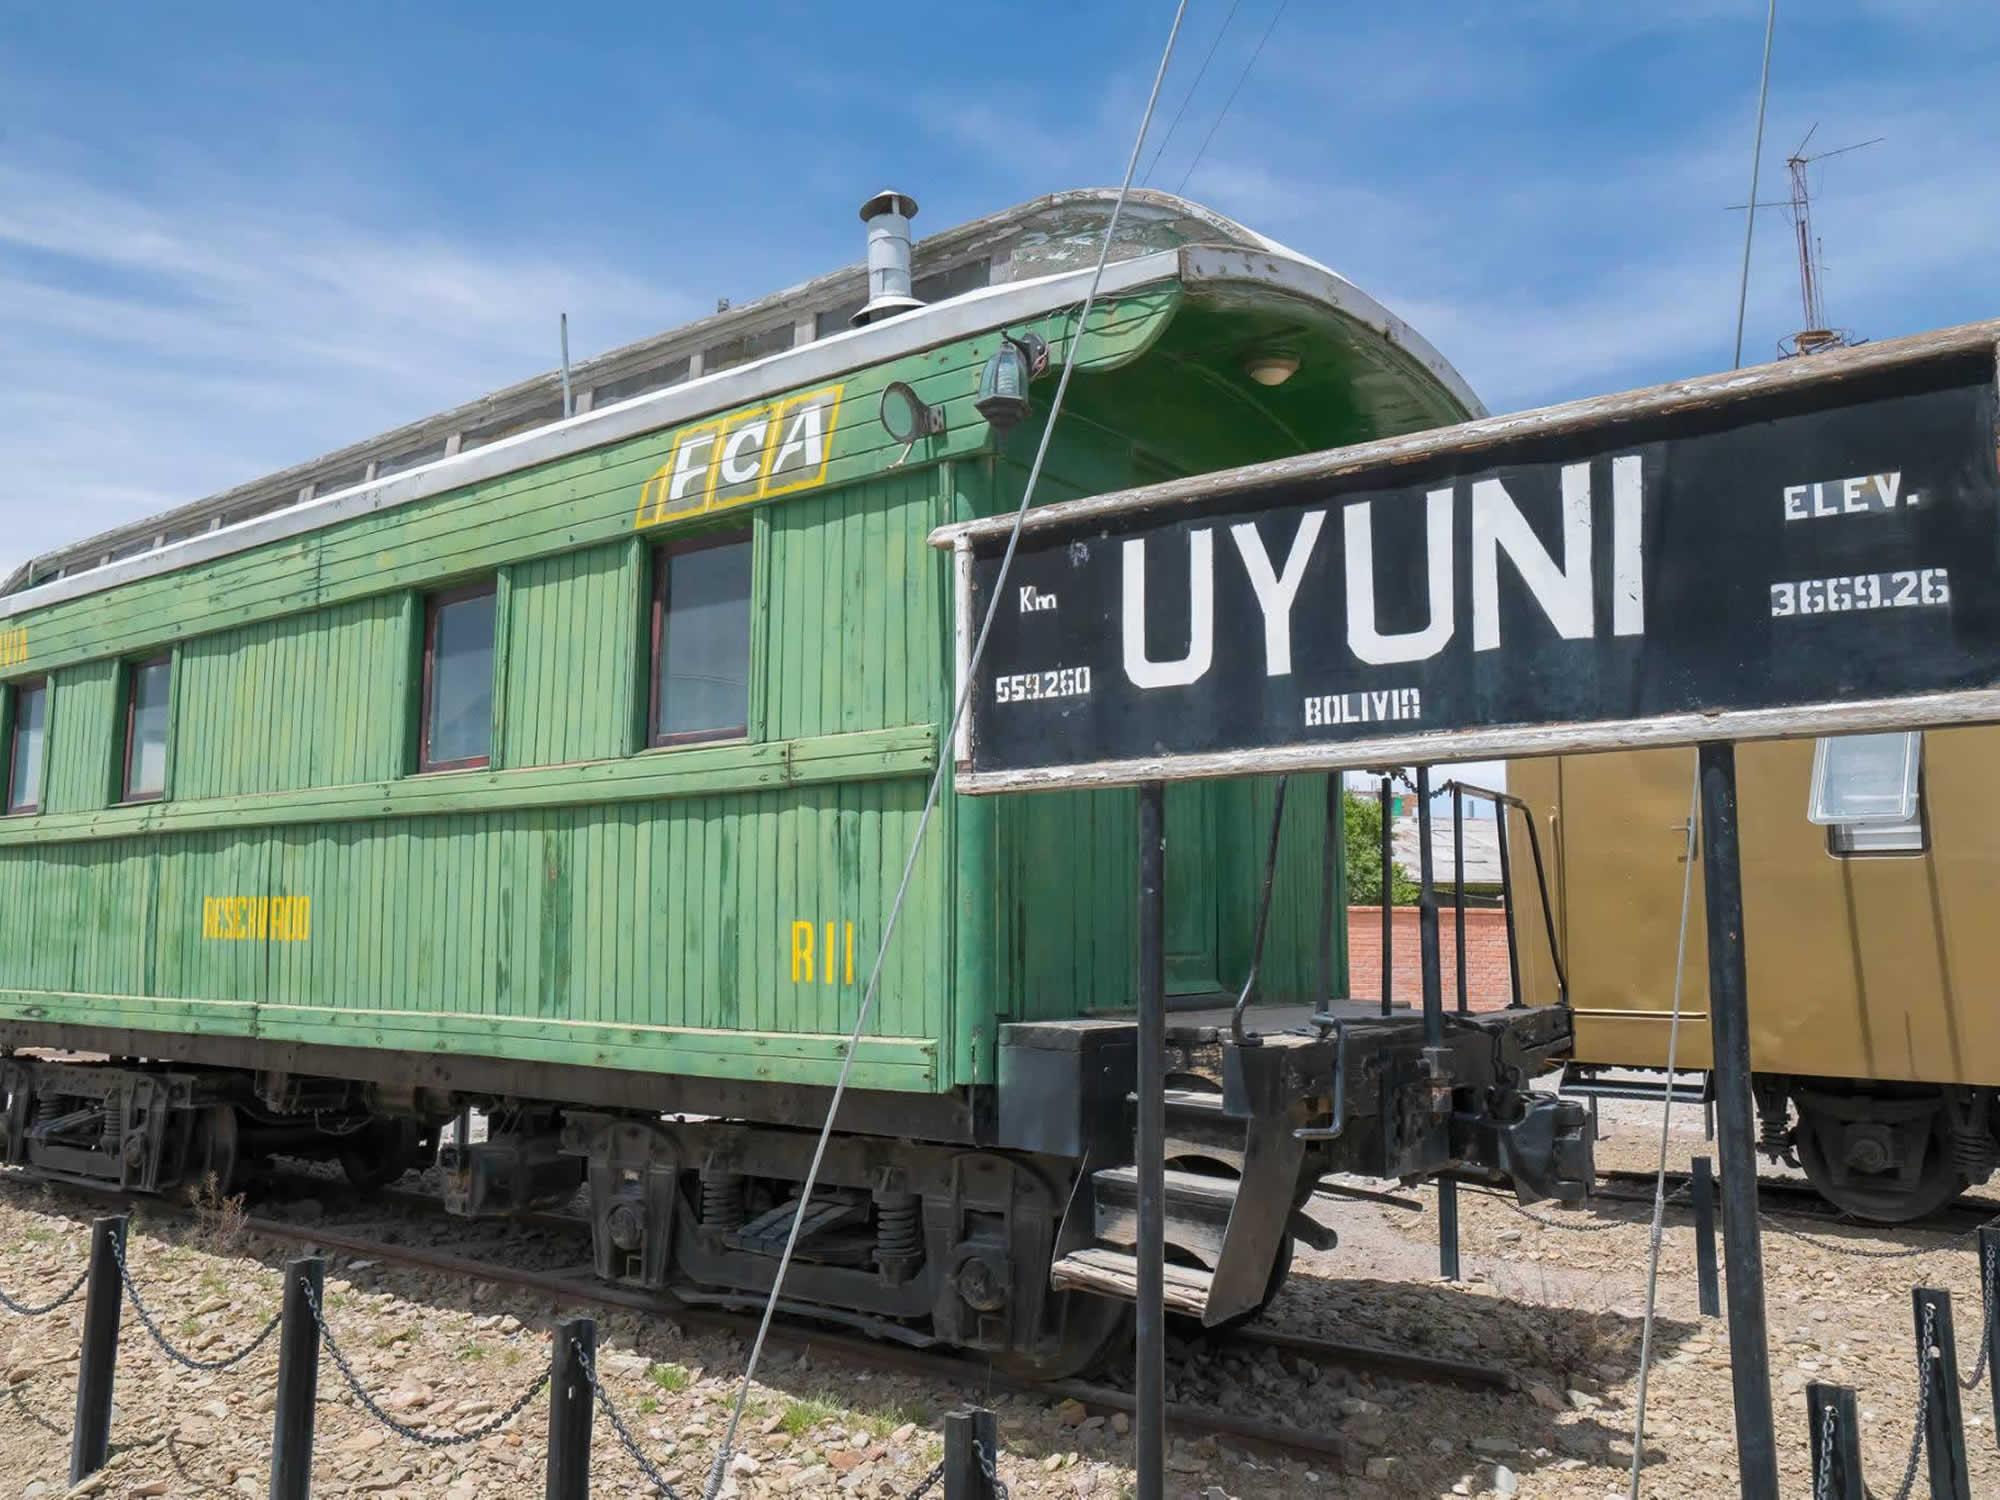 Town of Uyuni